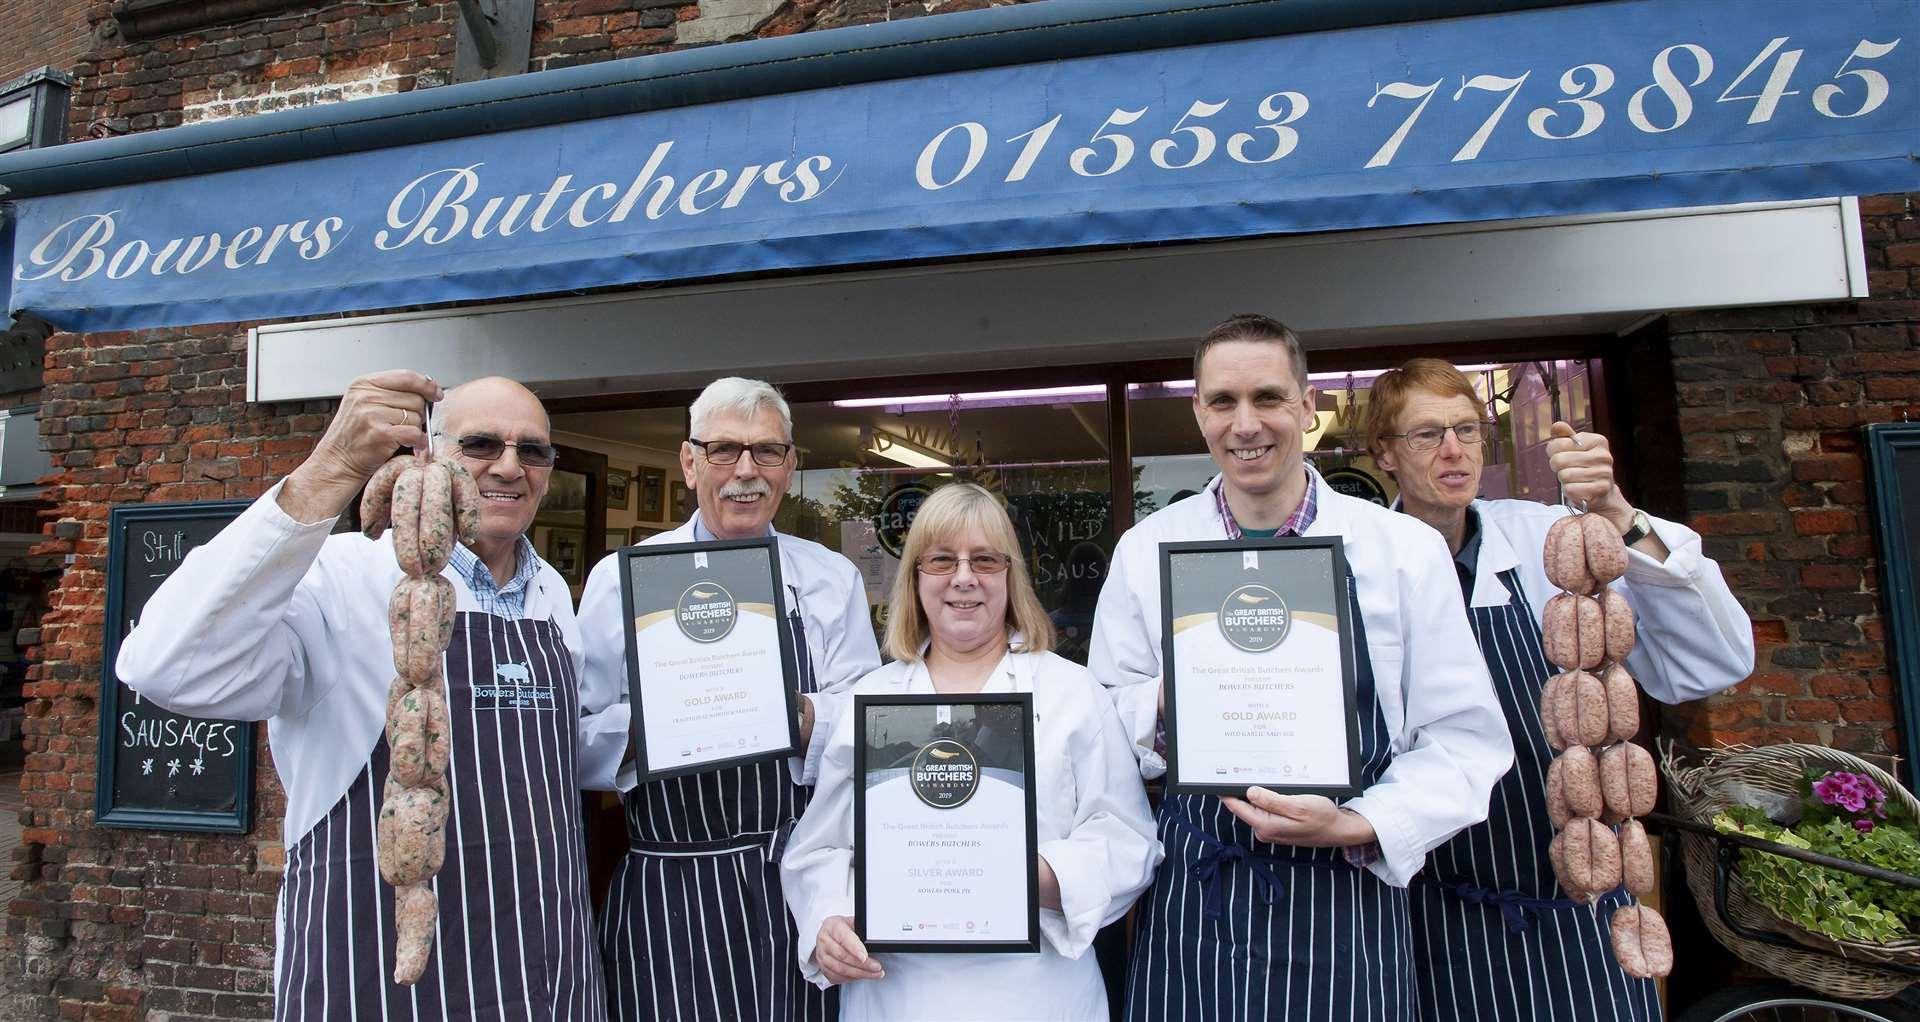 Gaywood butchers' sausages take gold in Great British awards